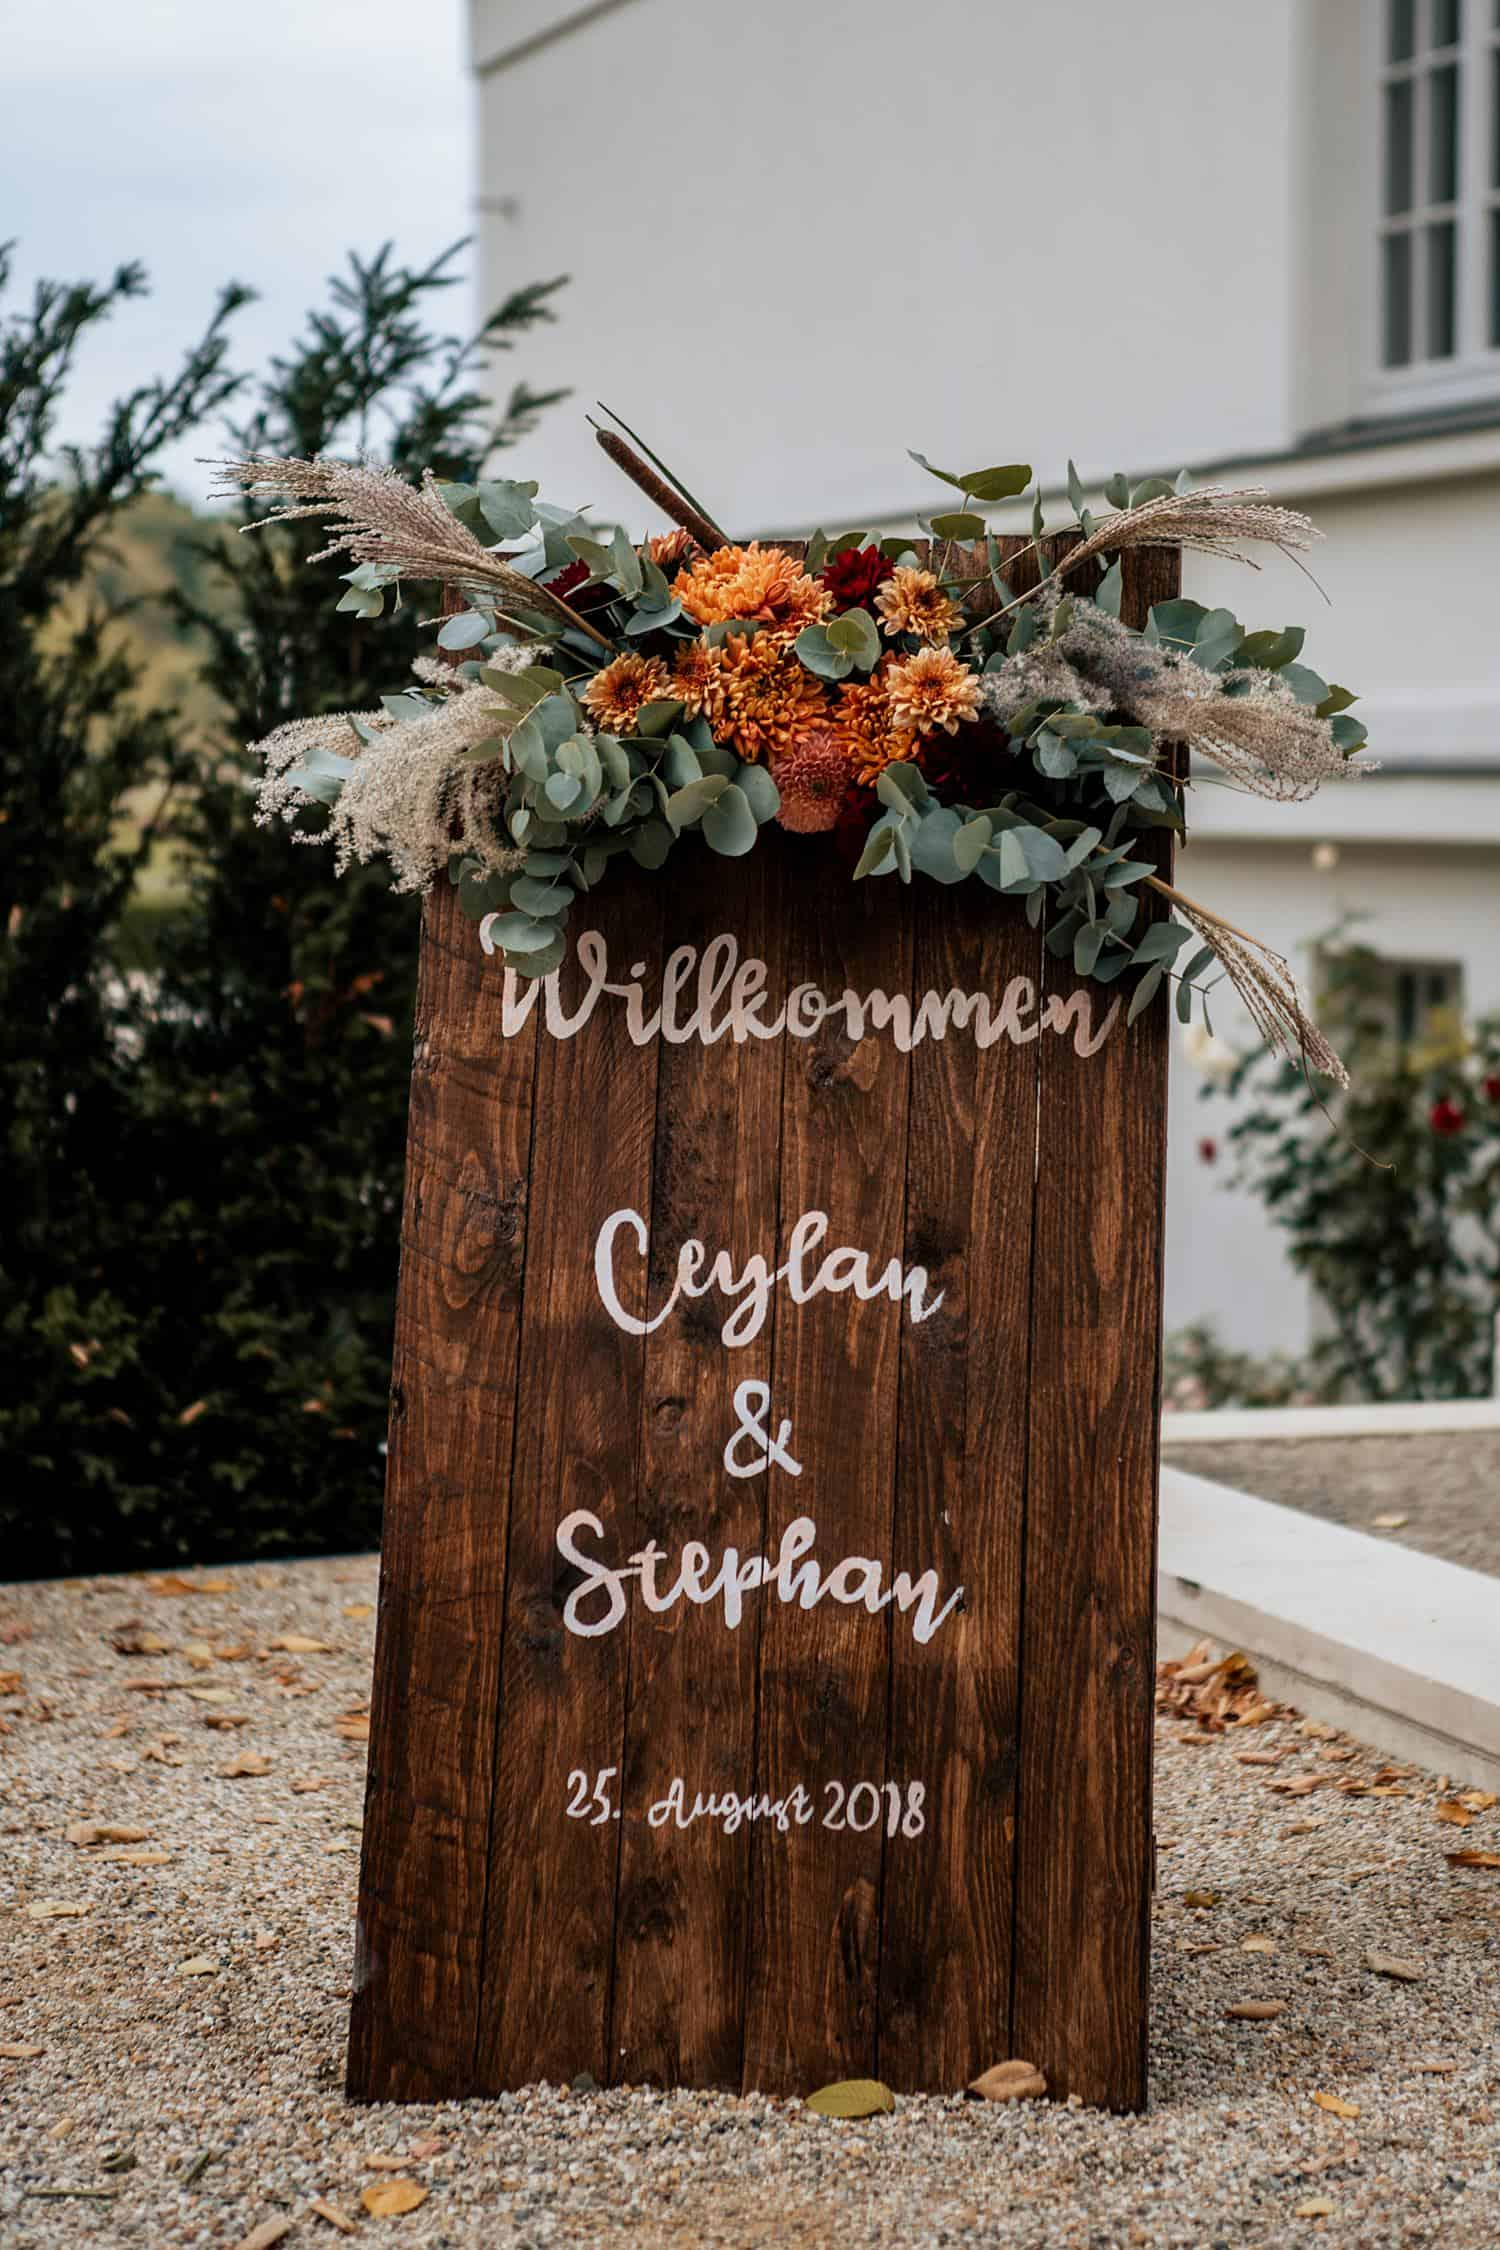 Gallery-Ceylan Stephan Wedding (110)-25.jpg